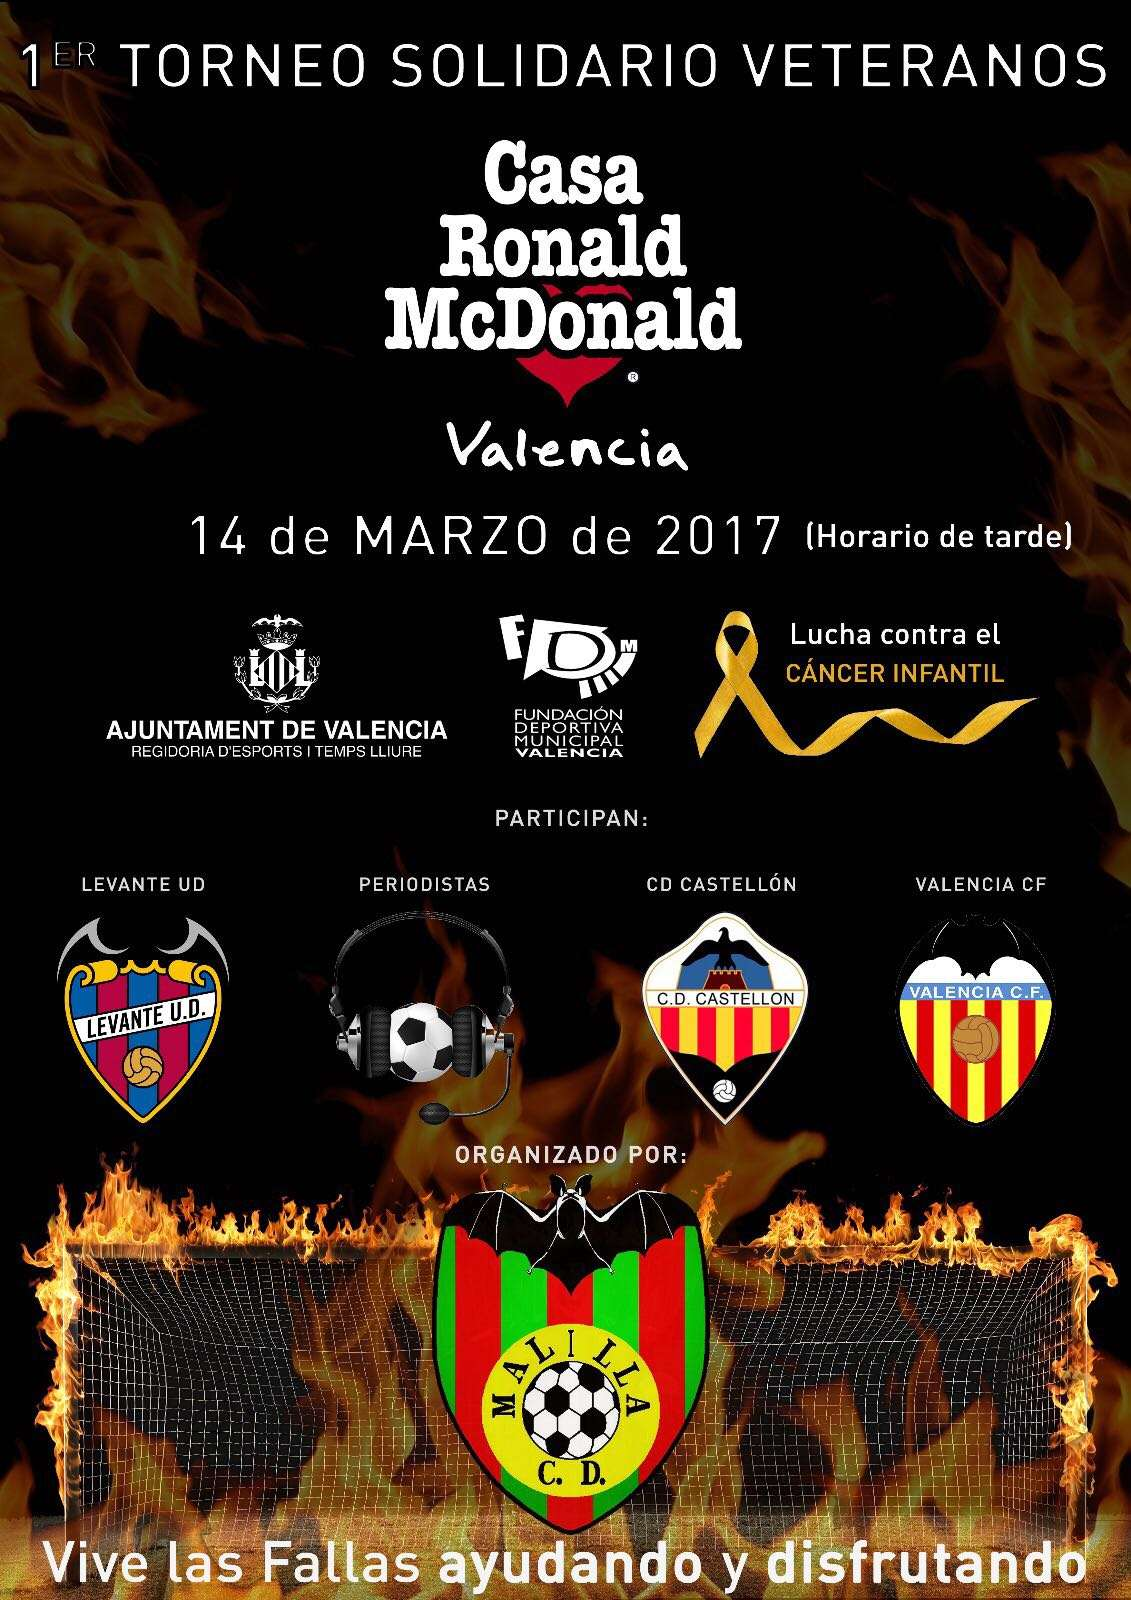 I torneo solidario del cd malilla y casa ronald mcdonald de valencia contra el c ncer infantil - Casa ronald mcdonald valencia ...